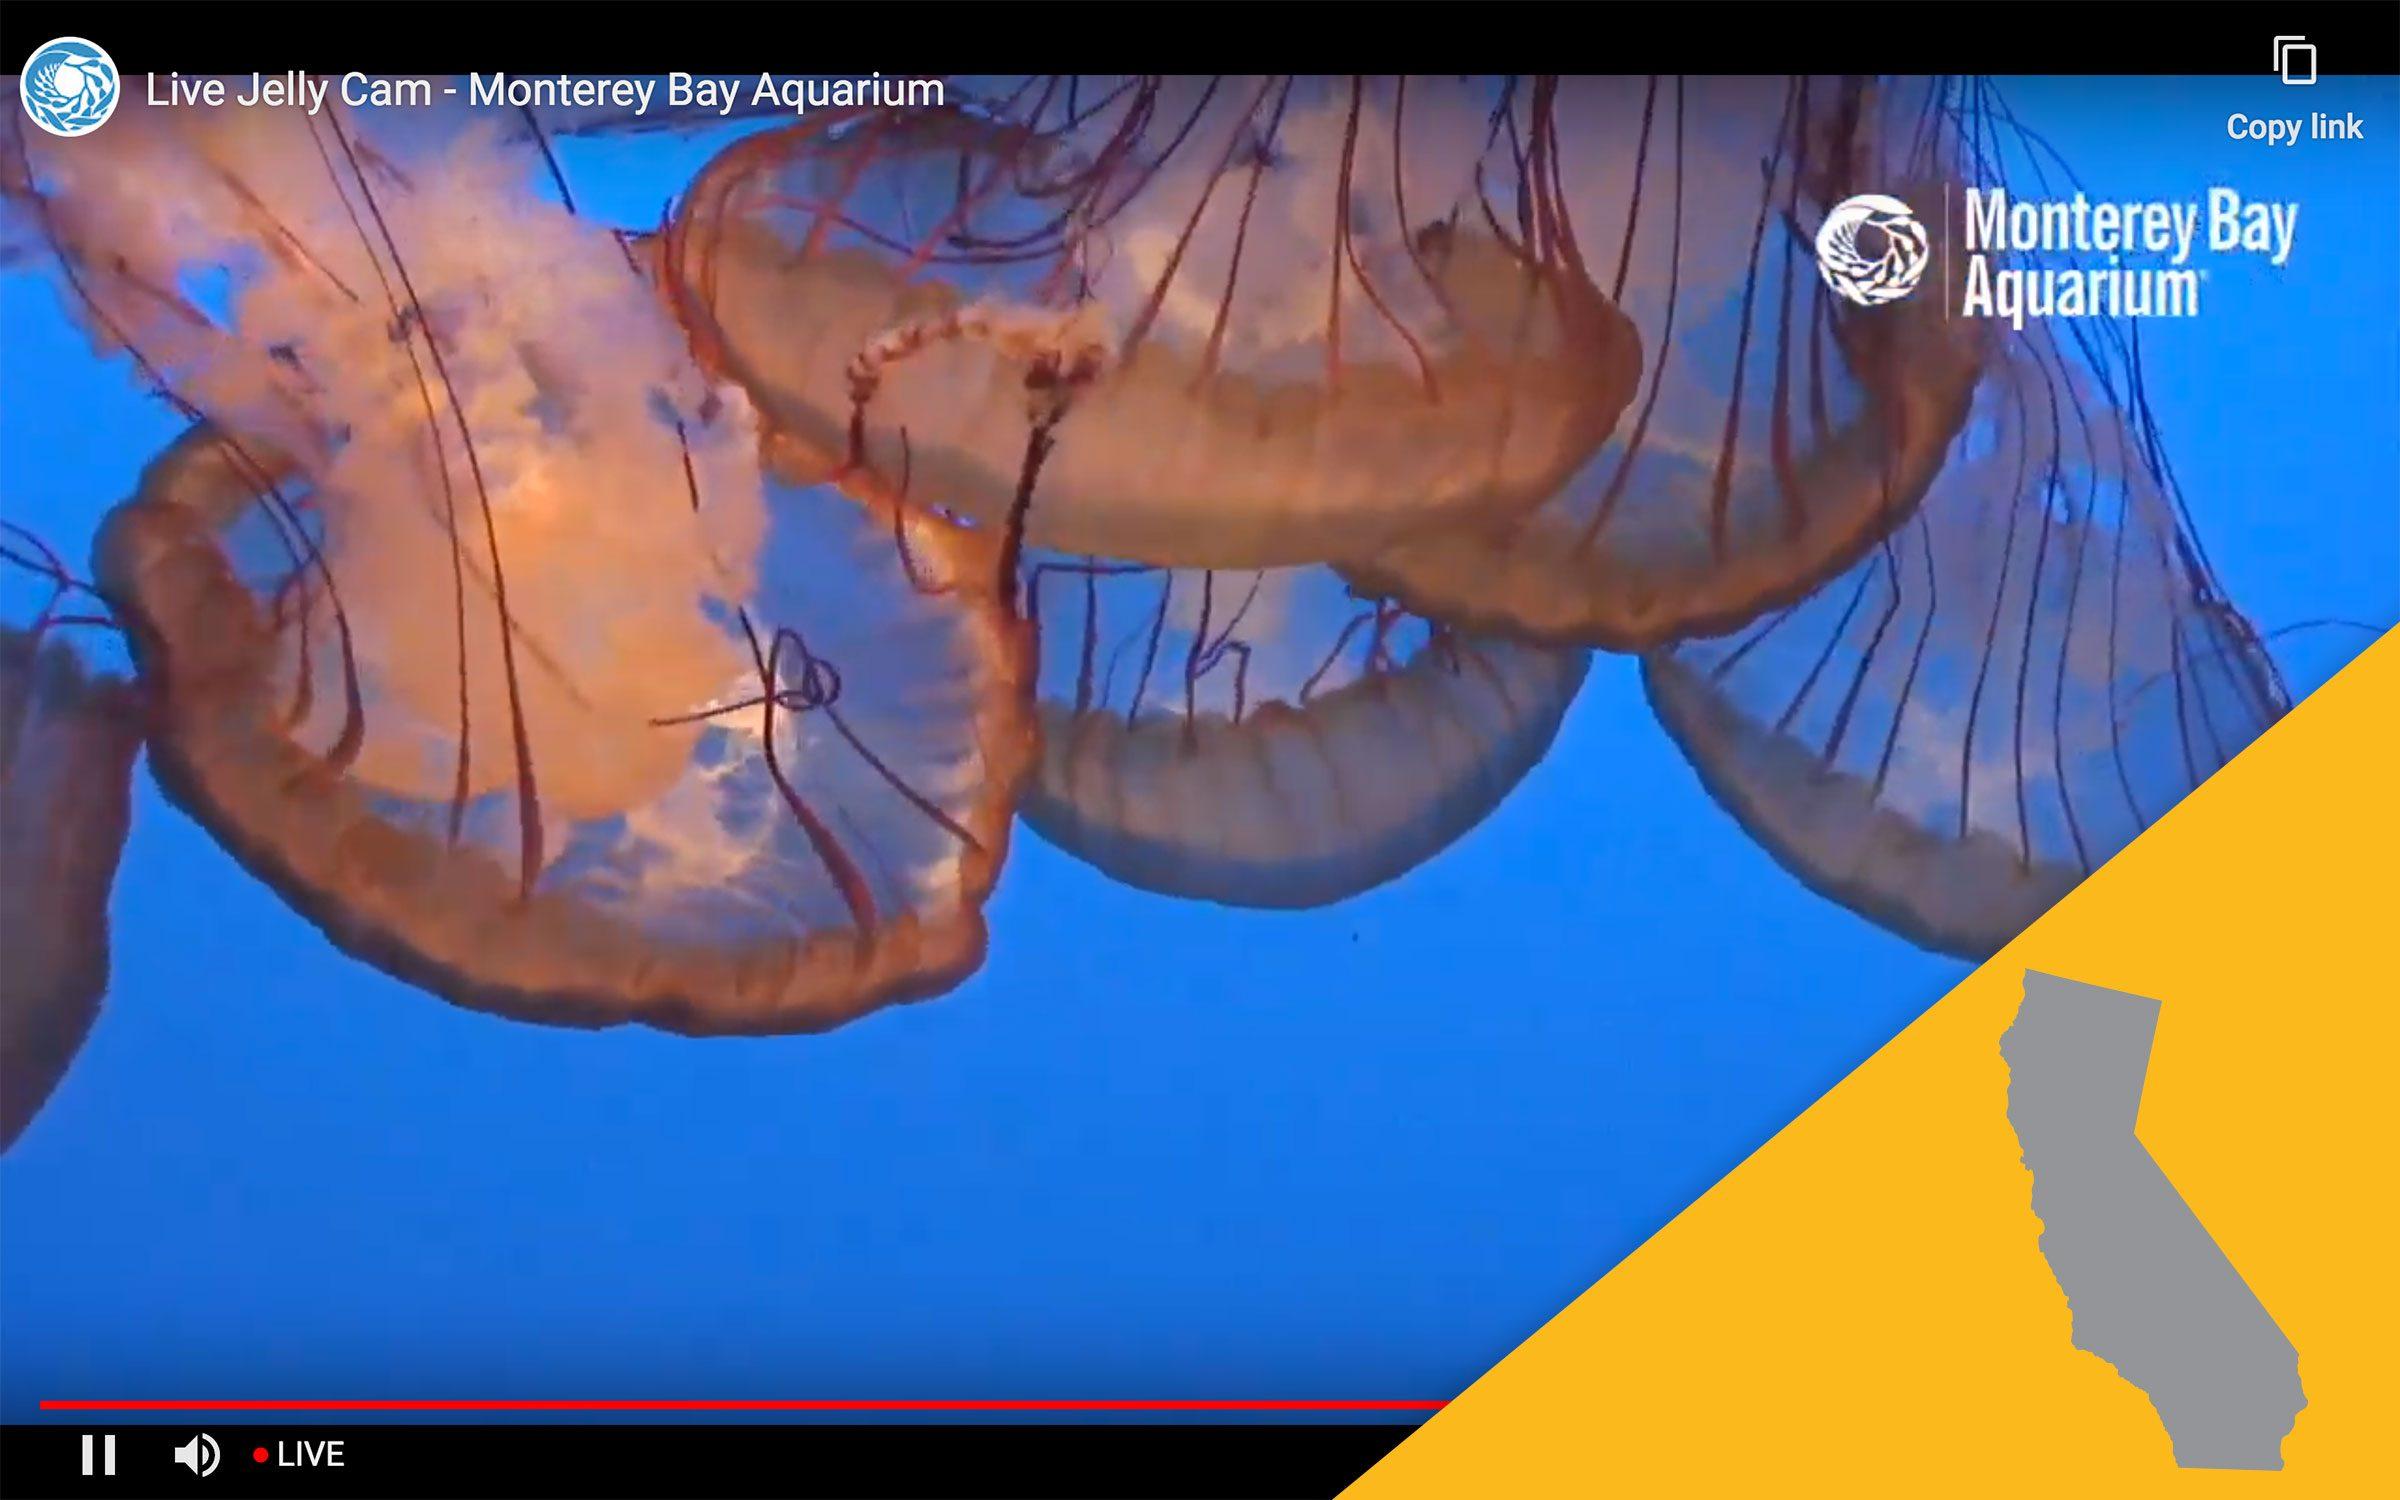 monterey bay aquarirum virtual tour